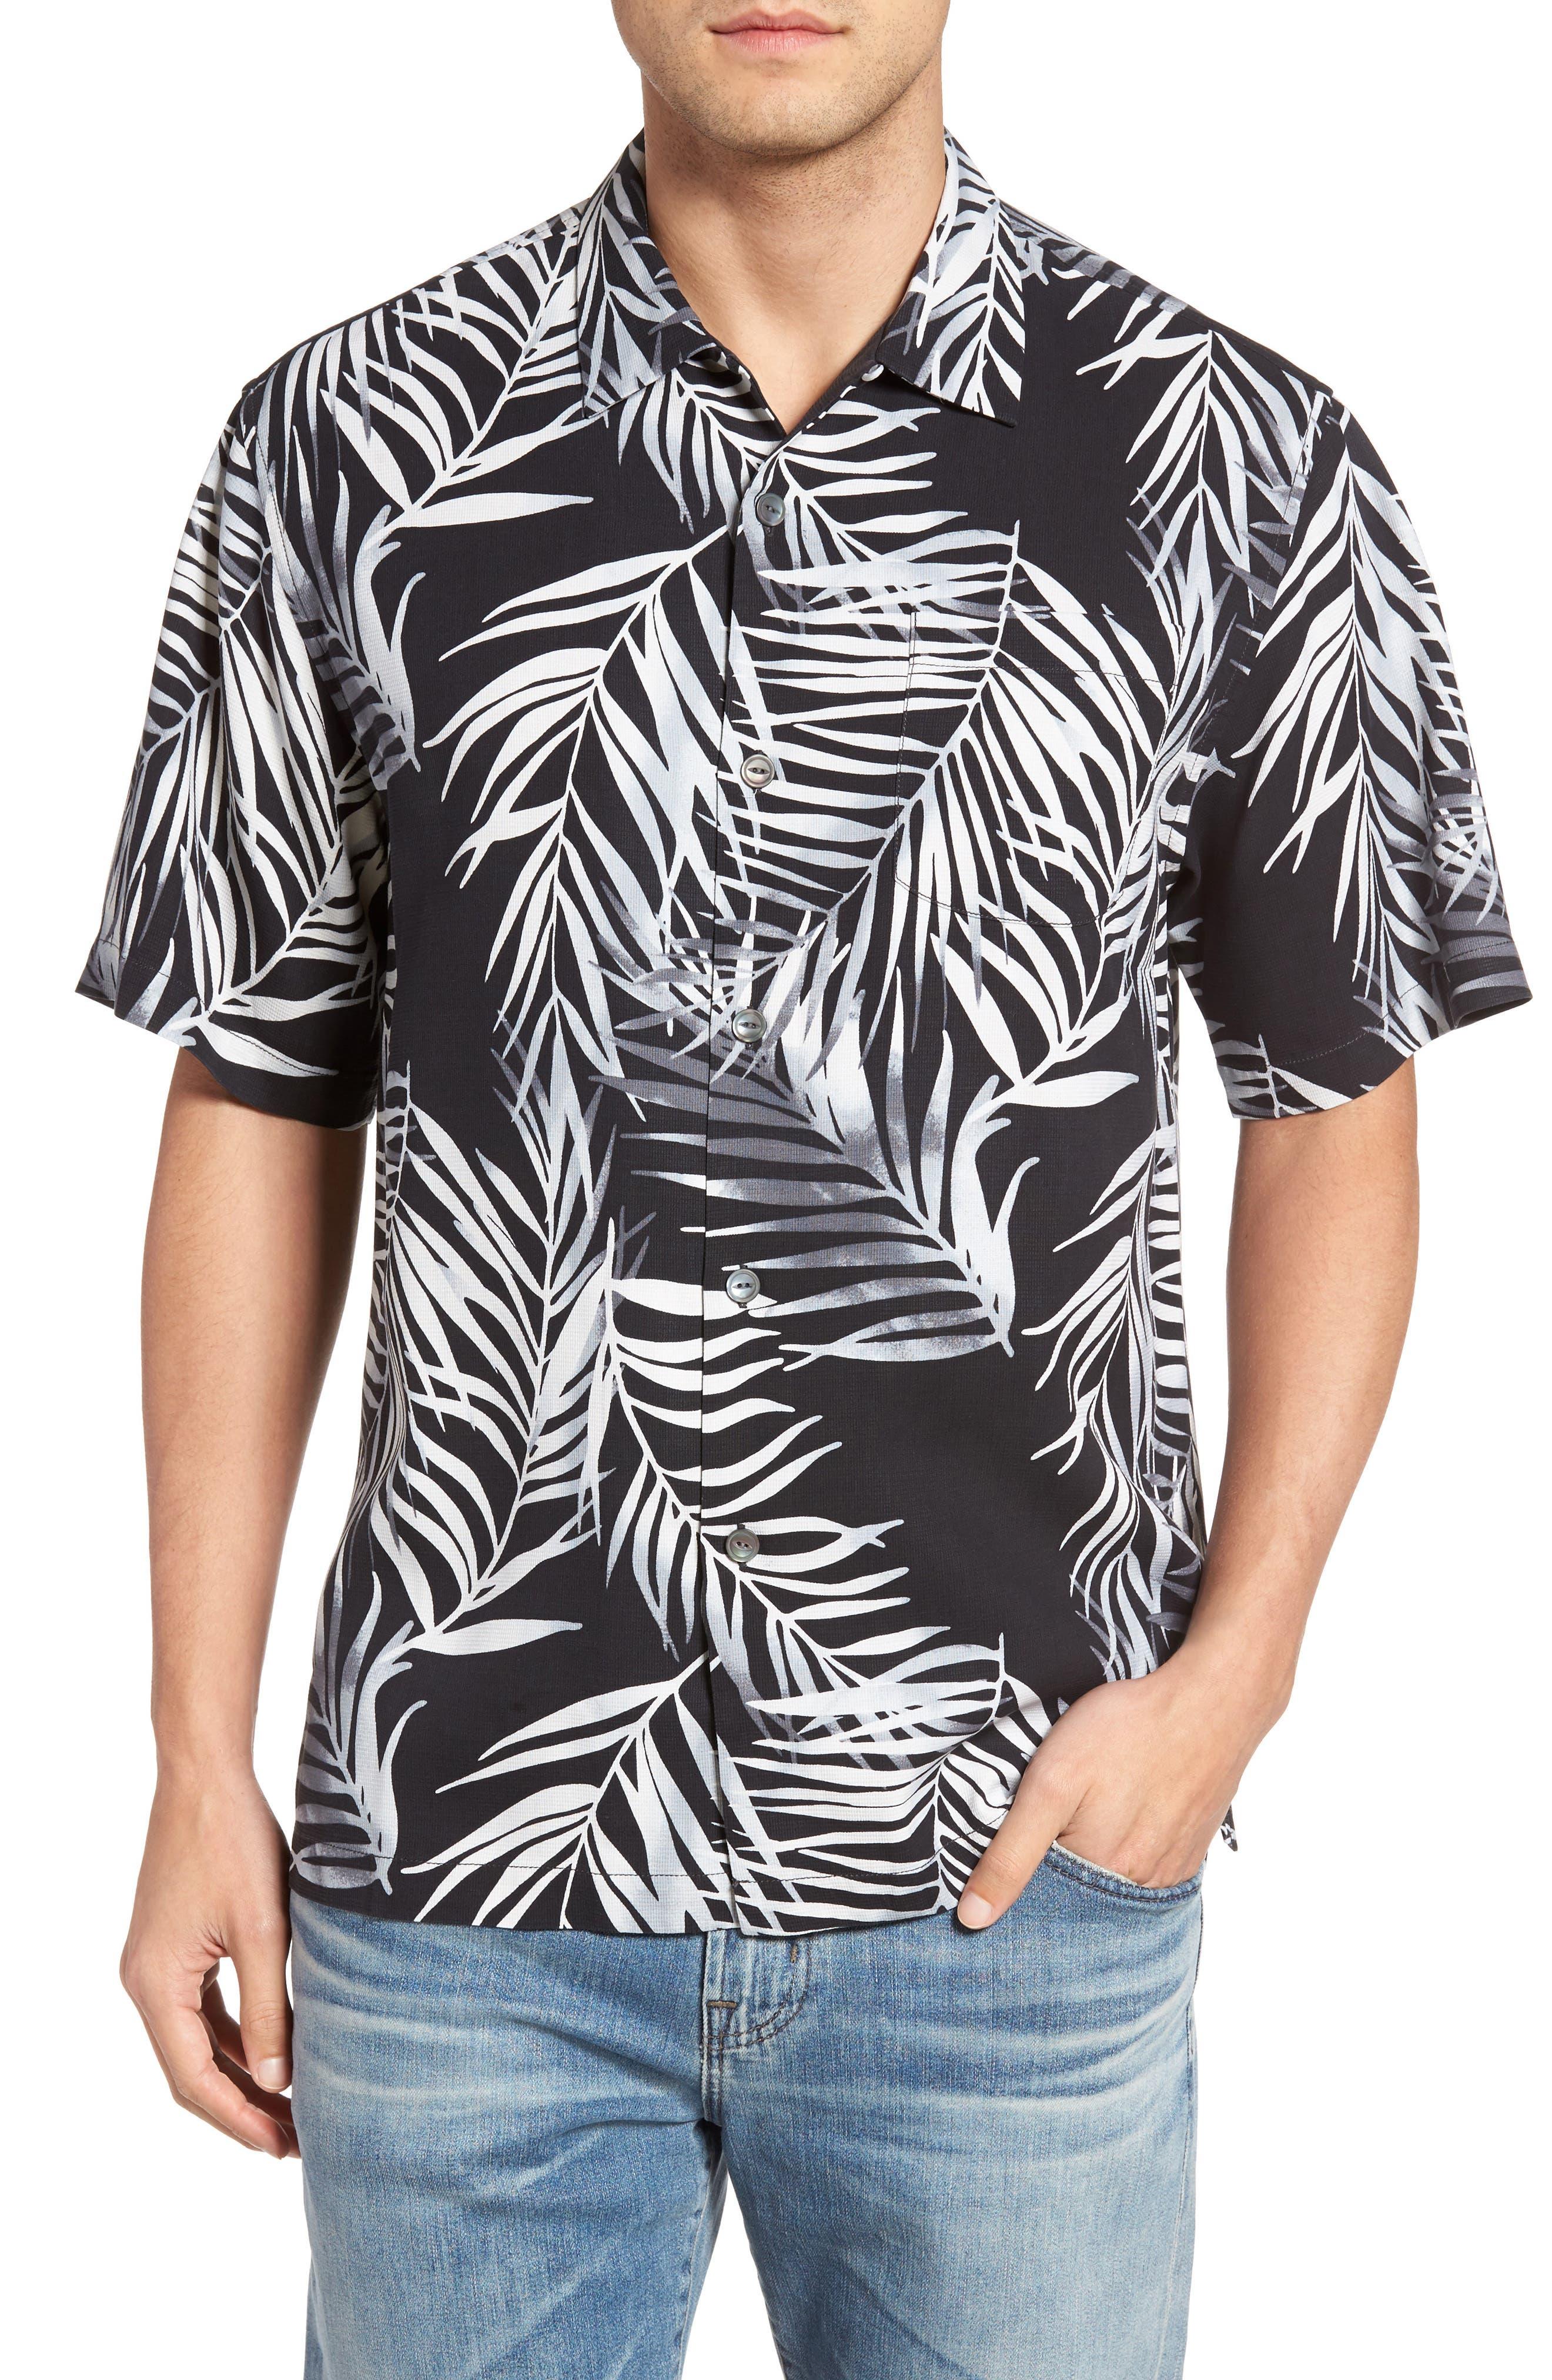 Beyond Frond Silk Camp Shirt,                         Main,                         color, Jet Black